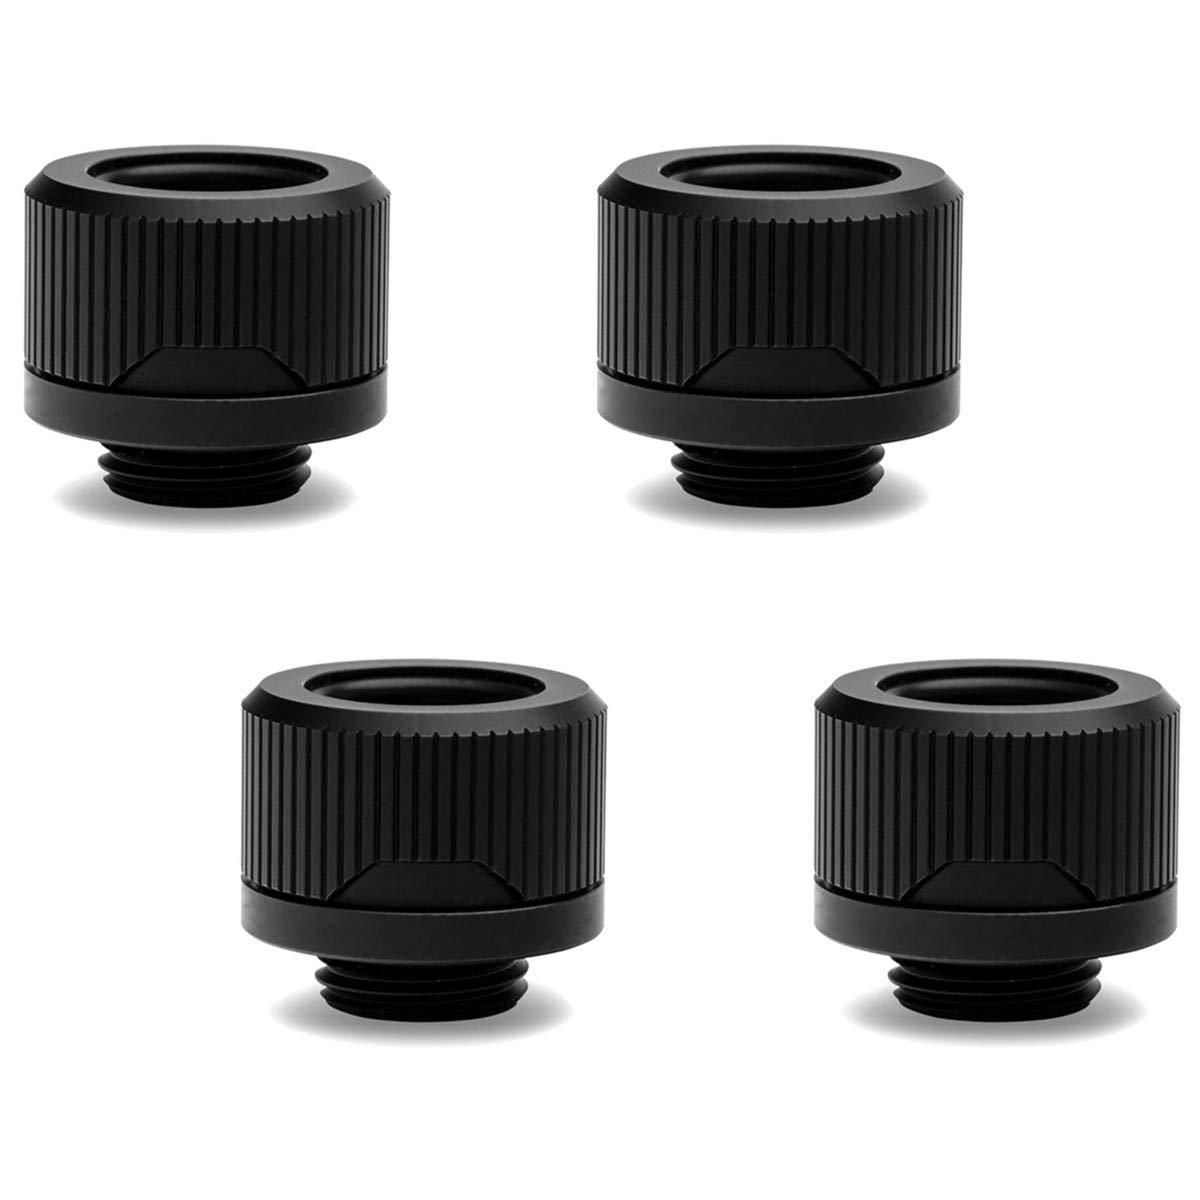 EKWB EK-Torque HTC-14 Compression Fitting for EKWB Rigid Tubing, 14mm OD, Black, 4-Pack